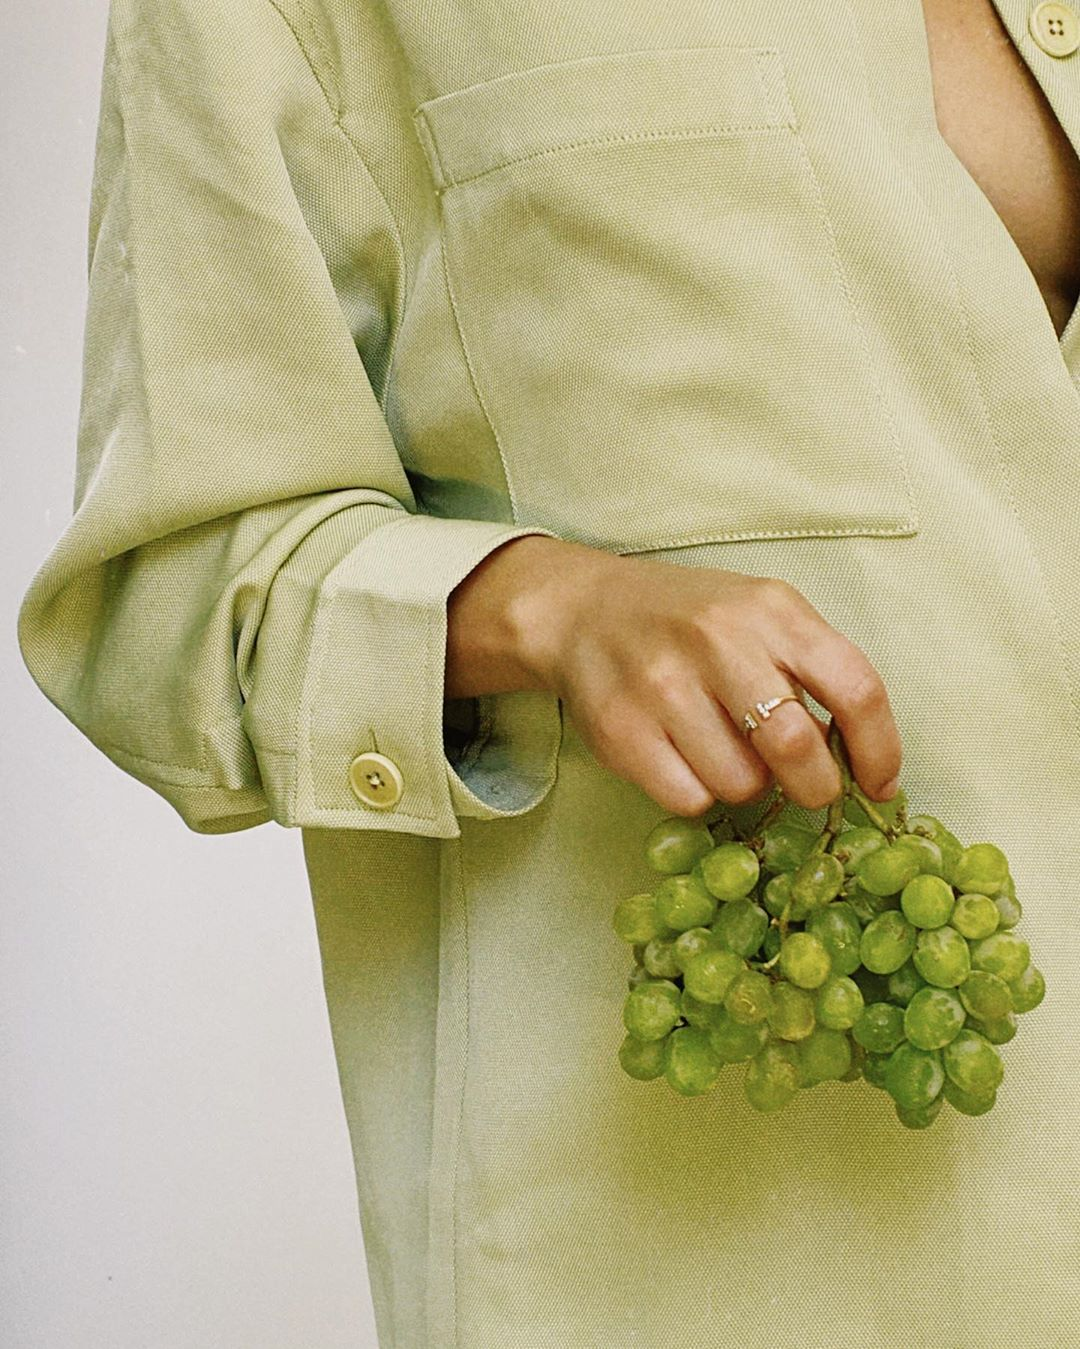 Yovanna Ventura wearing skinny pistachio Green high waist knee length shorts